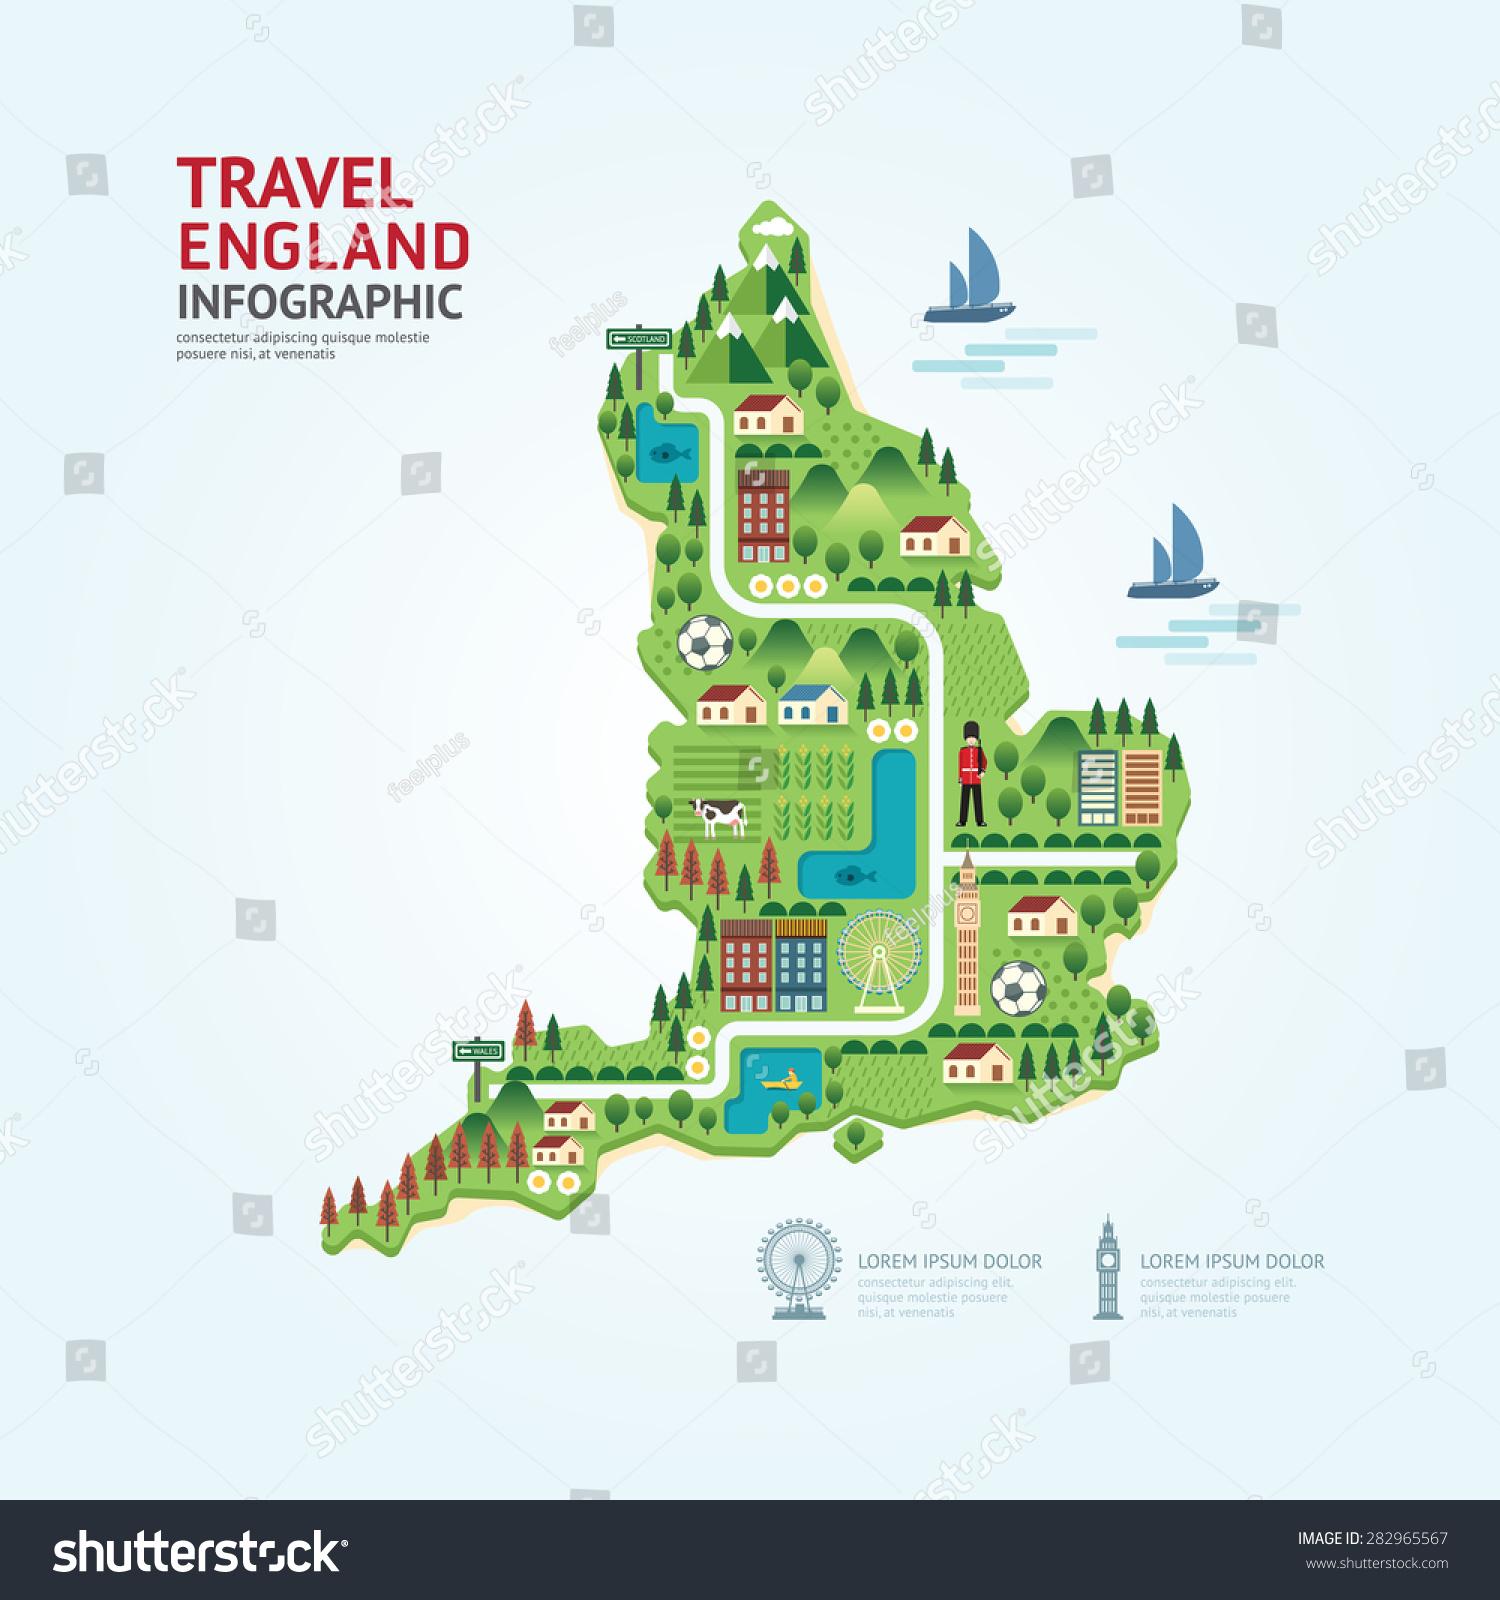 Web Site Design Map: Infographic Travel And Landmark England,United Kingdom Map